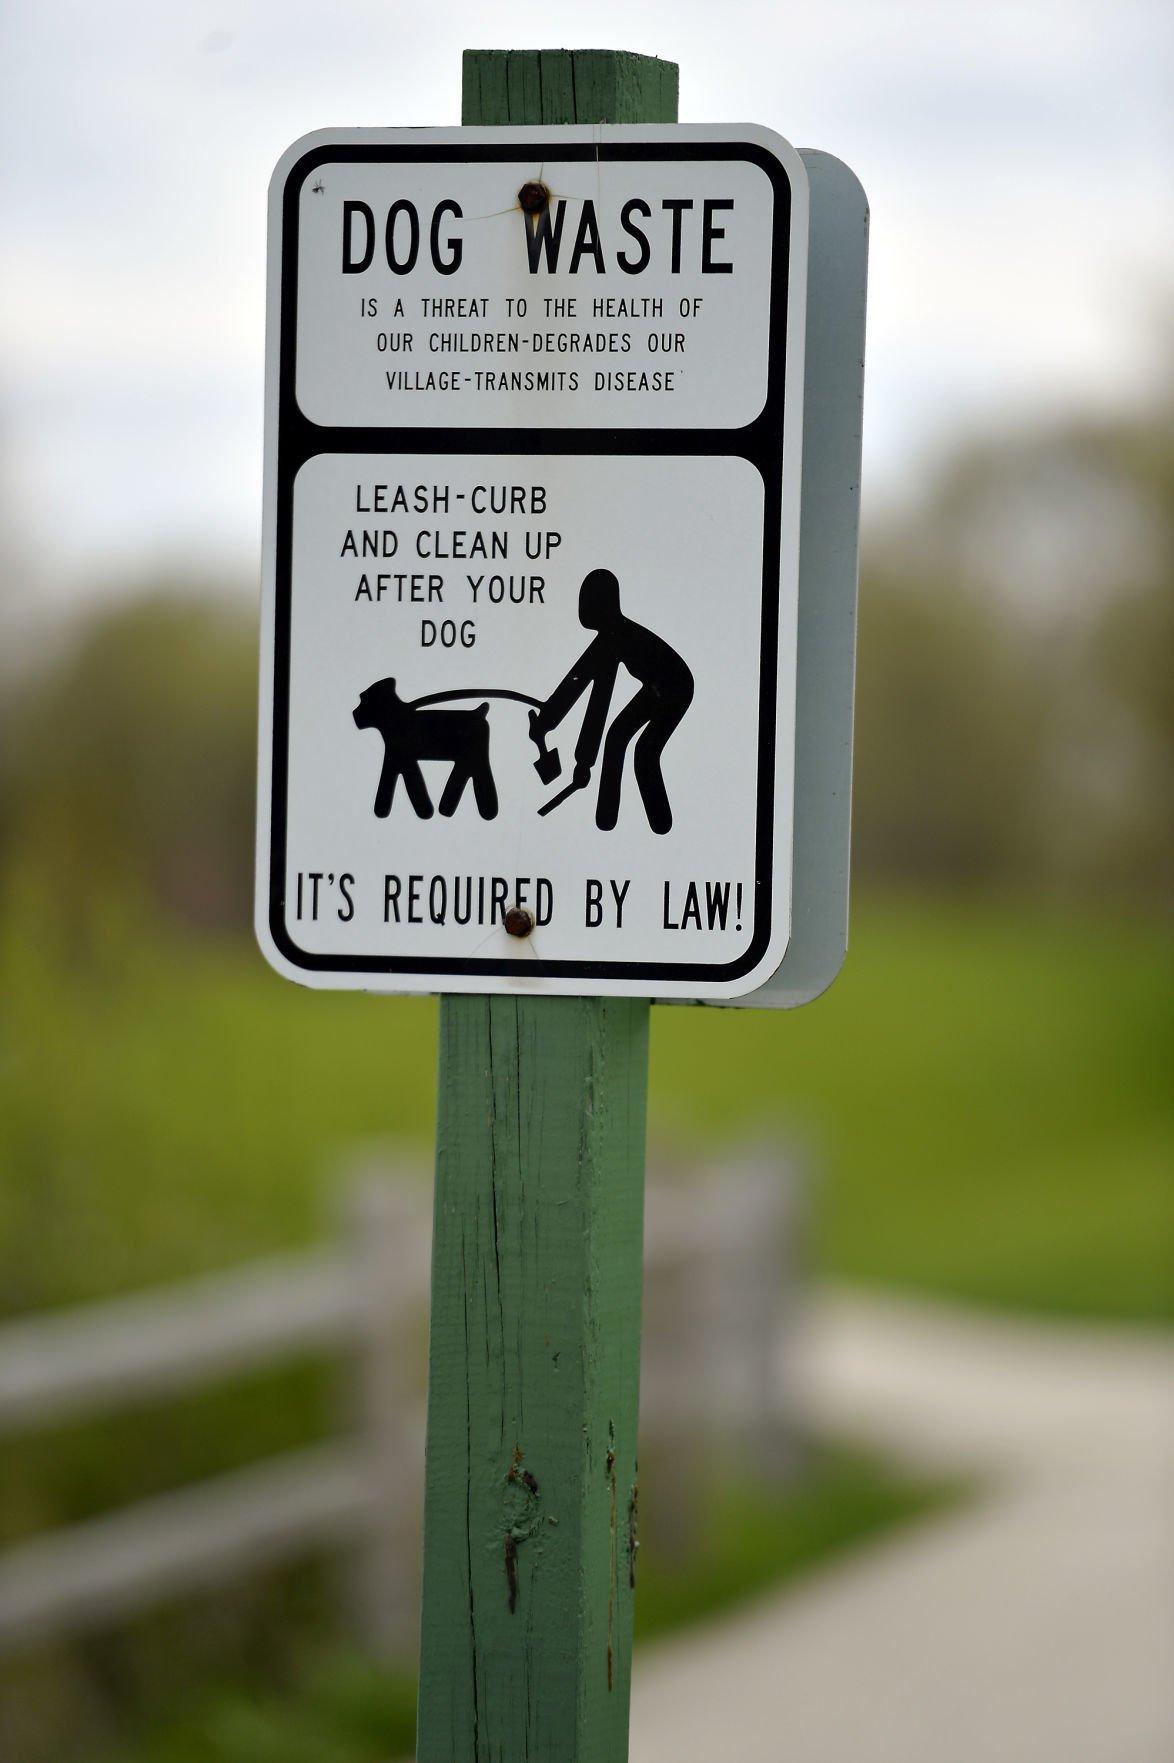 FIX IT UNLEASHED DOGS PLEASANT PRAIRIE